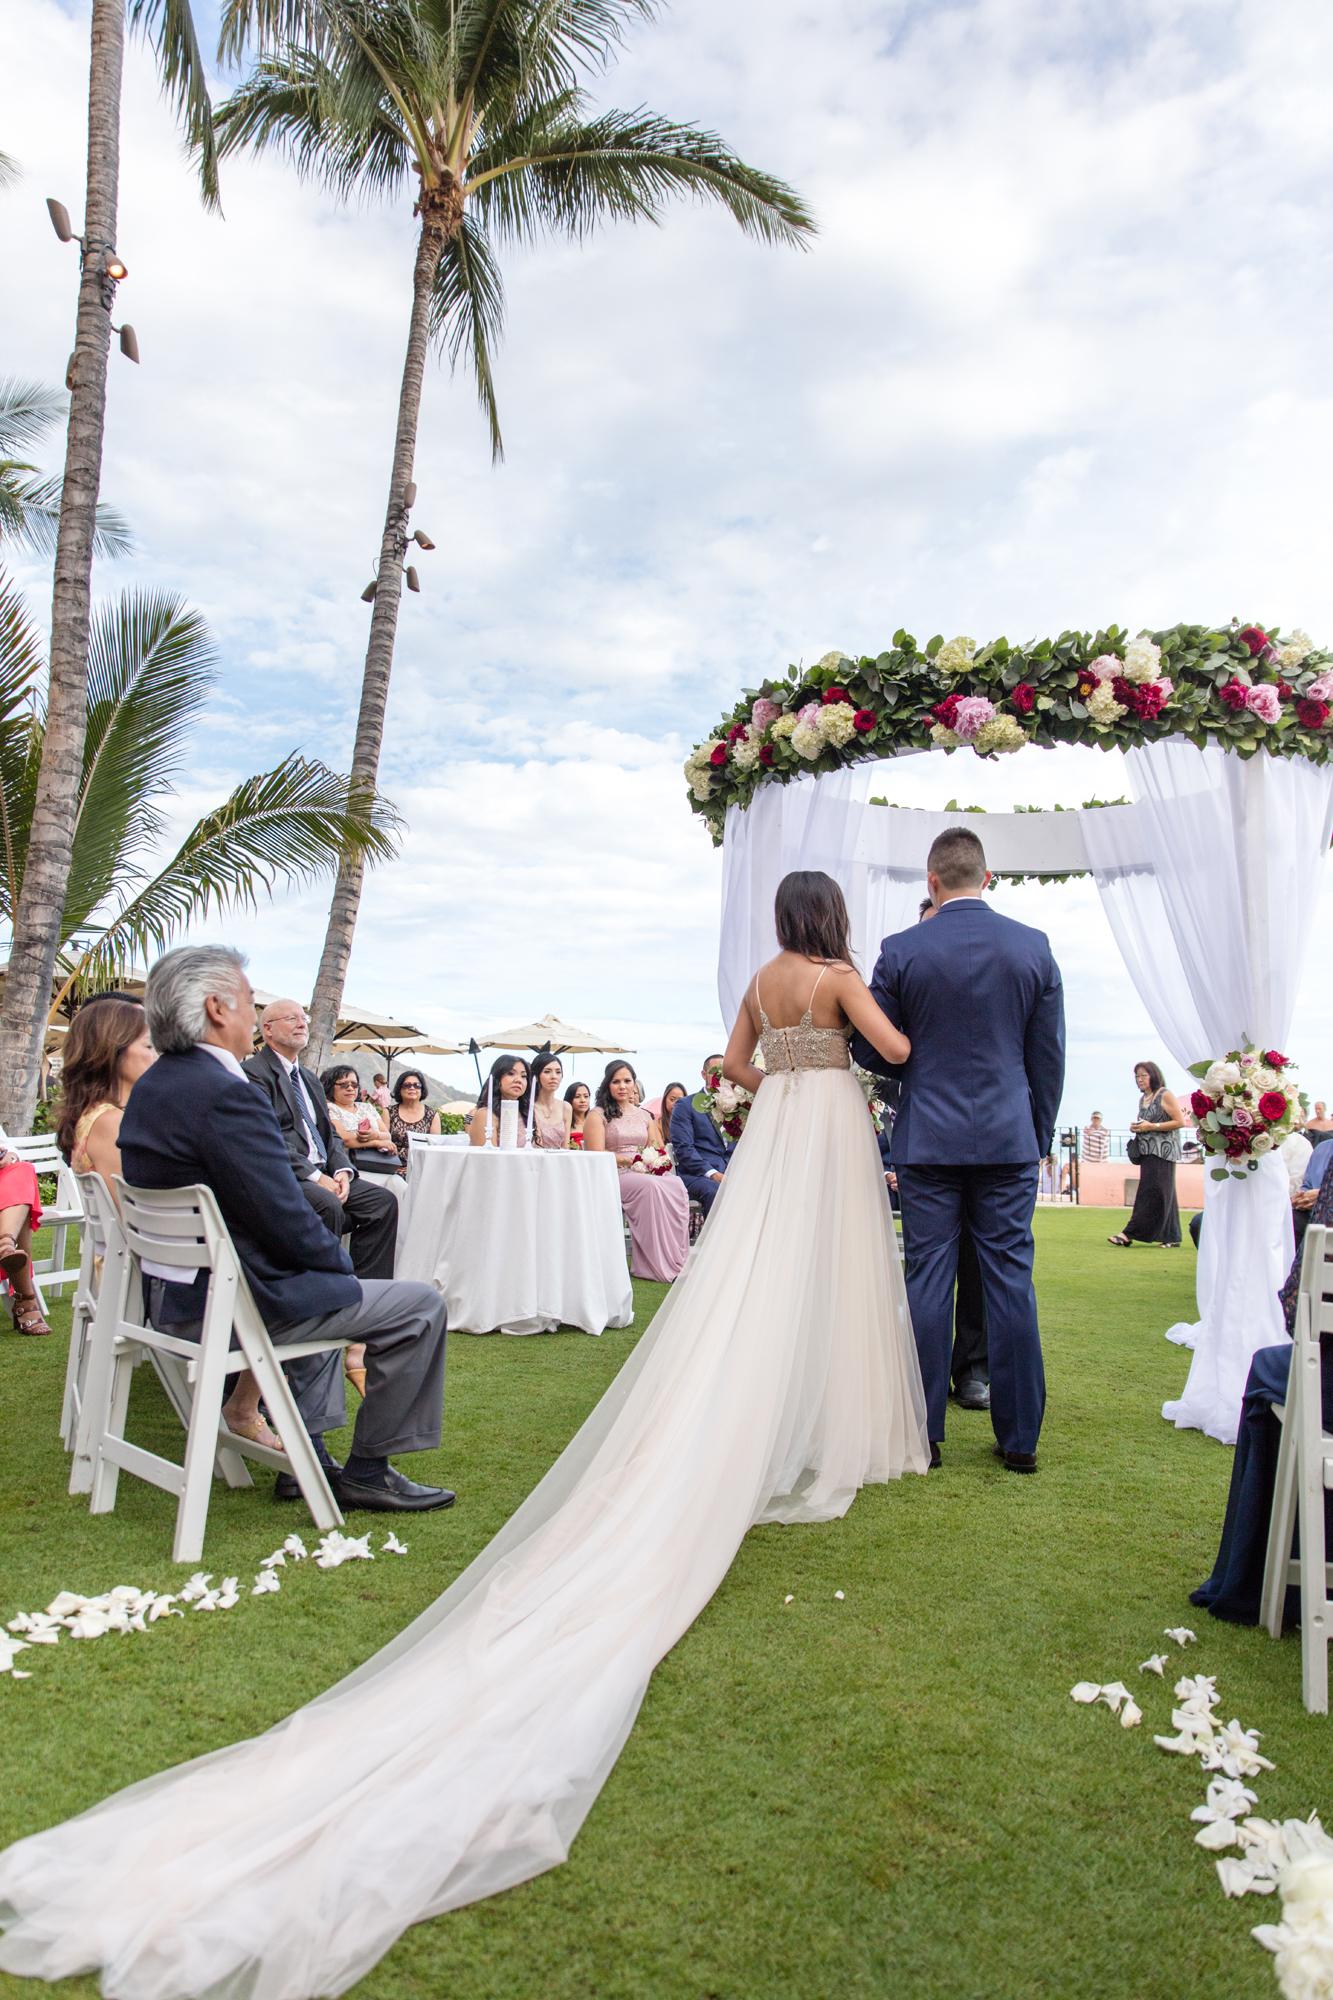 Luxurious Resort Wedding At The Royal Hawaiian Hotel